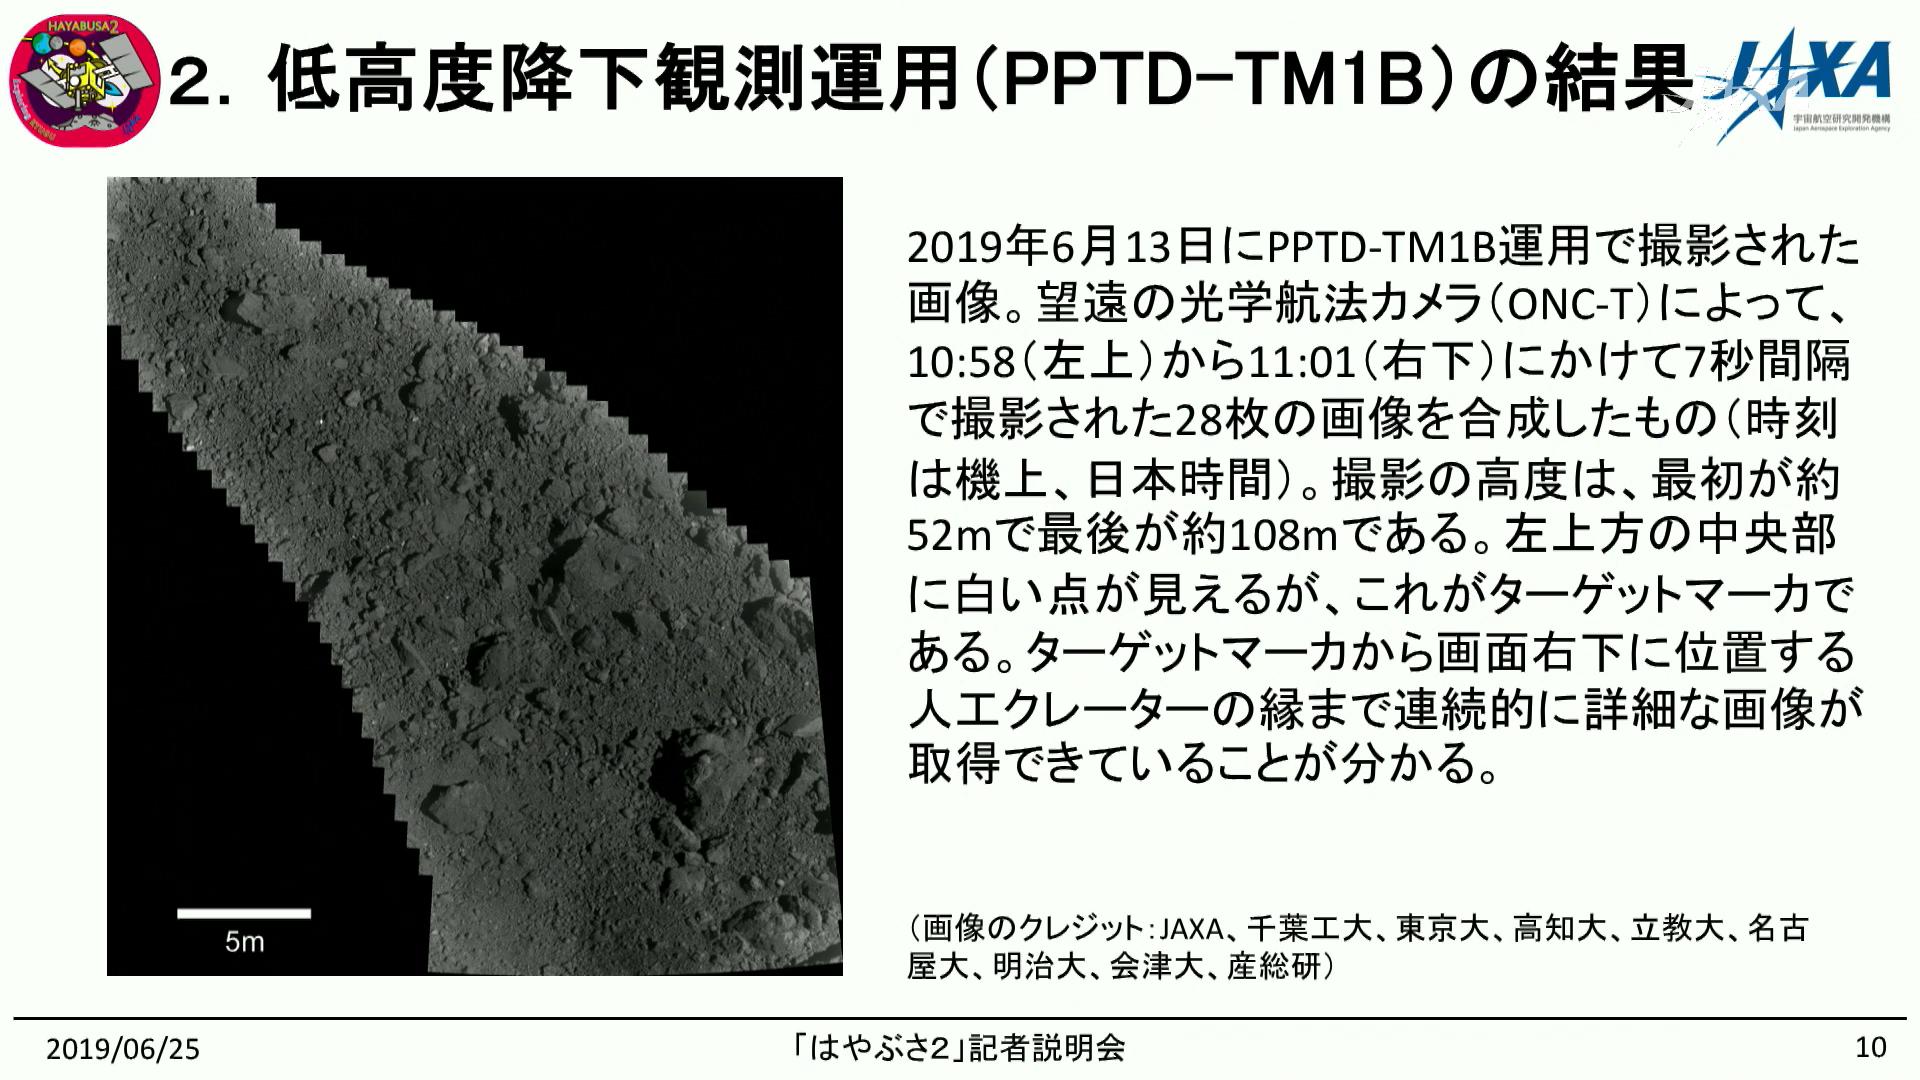 f:id:Imamura:20190625234722p:plain